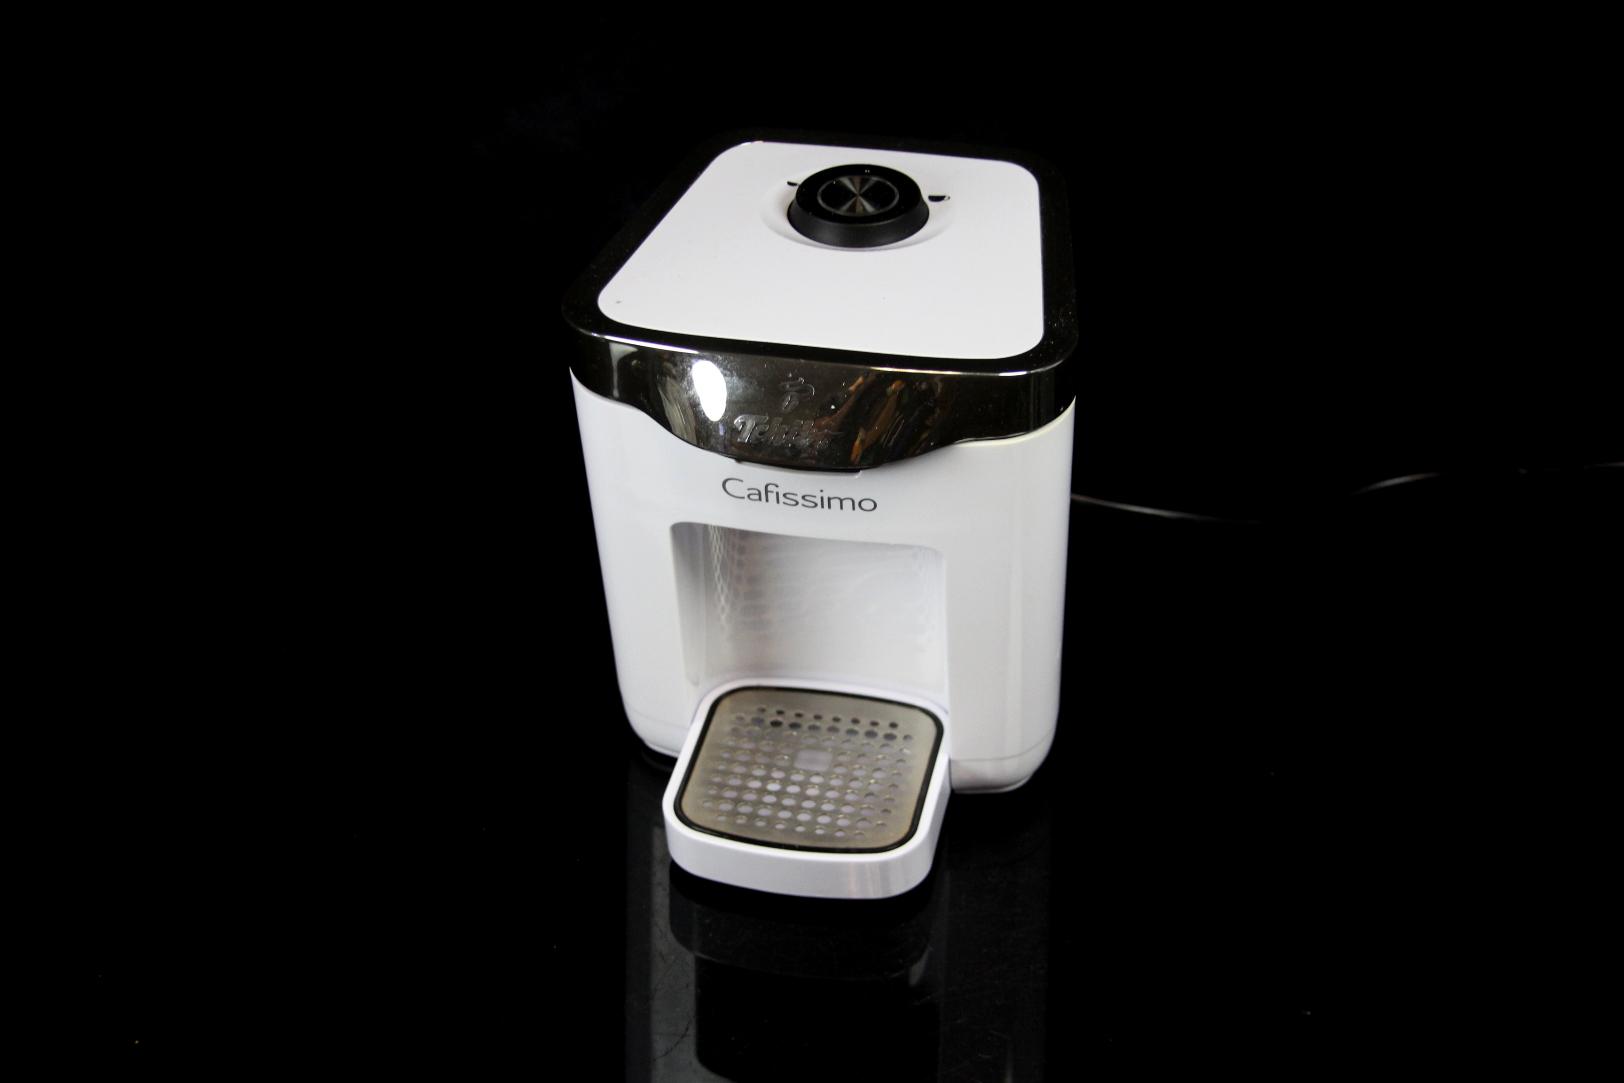 tchibo cafissimo duo kapselmaschine kapsel kaffeemaschine kaffeeautomat weiss ebay. Black Bedroom Furniture Sets. Home Design Ideas